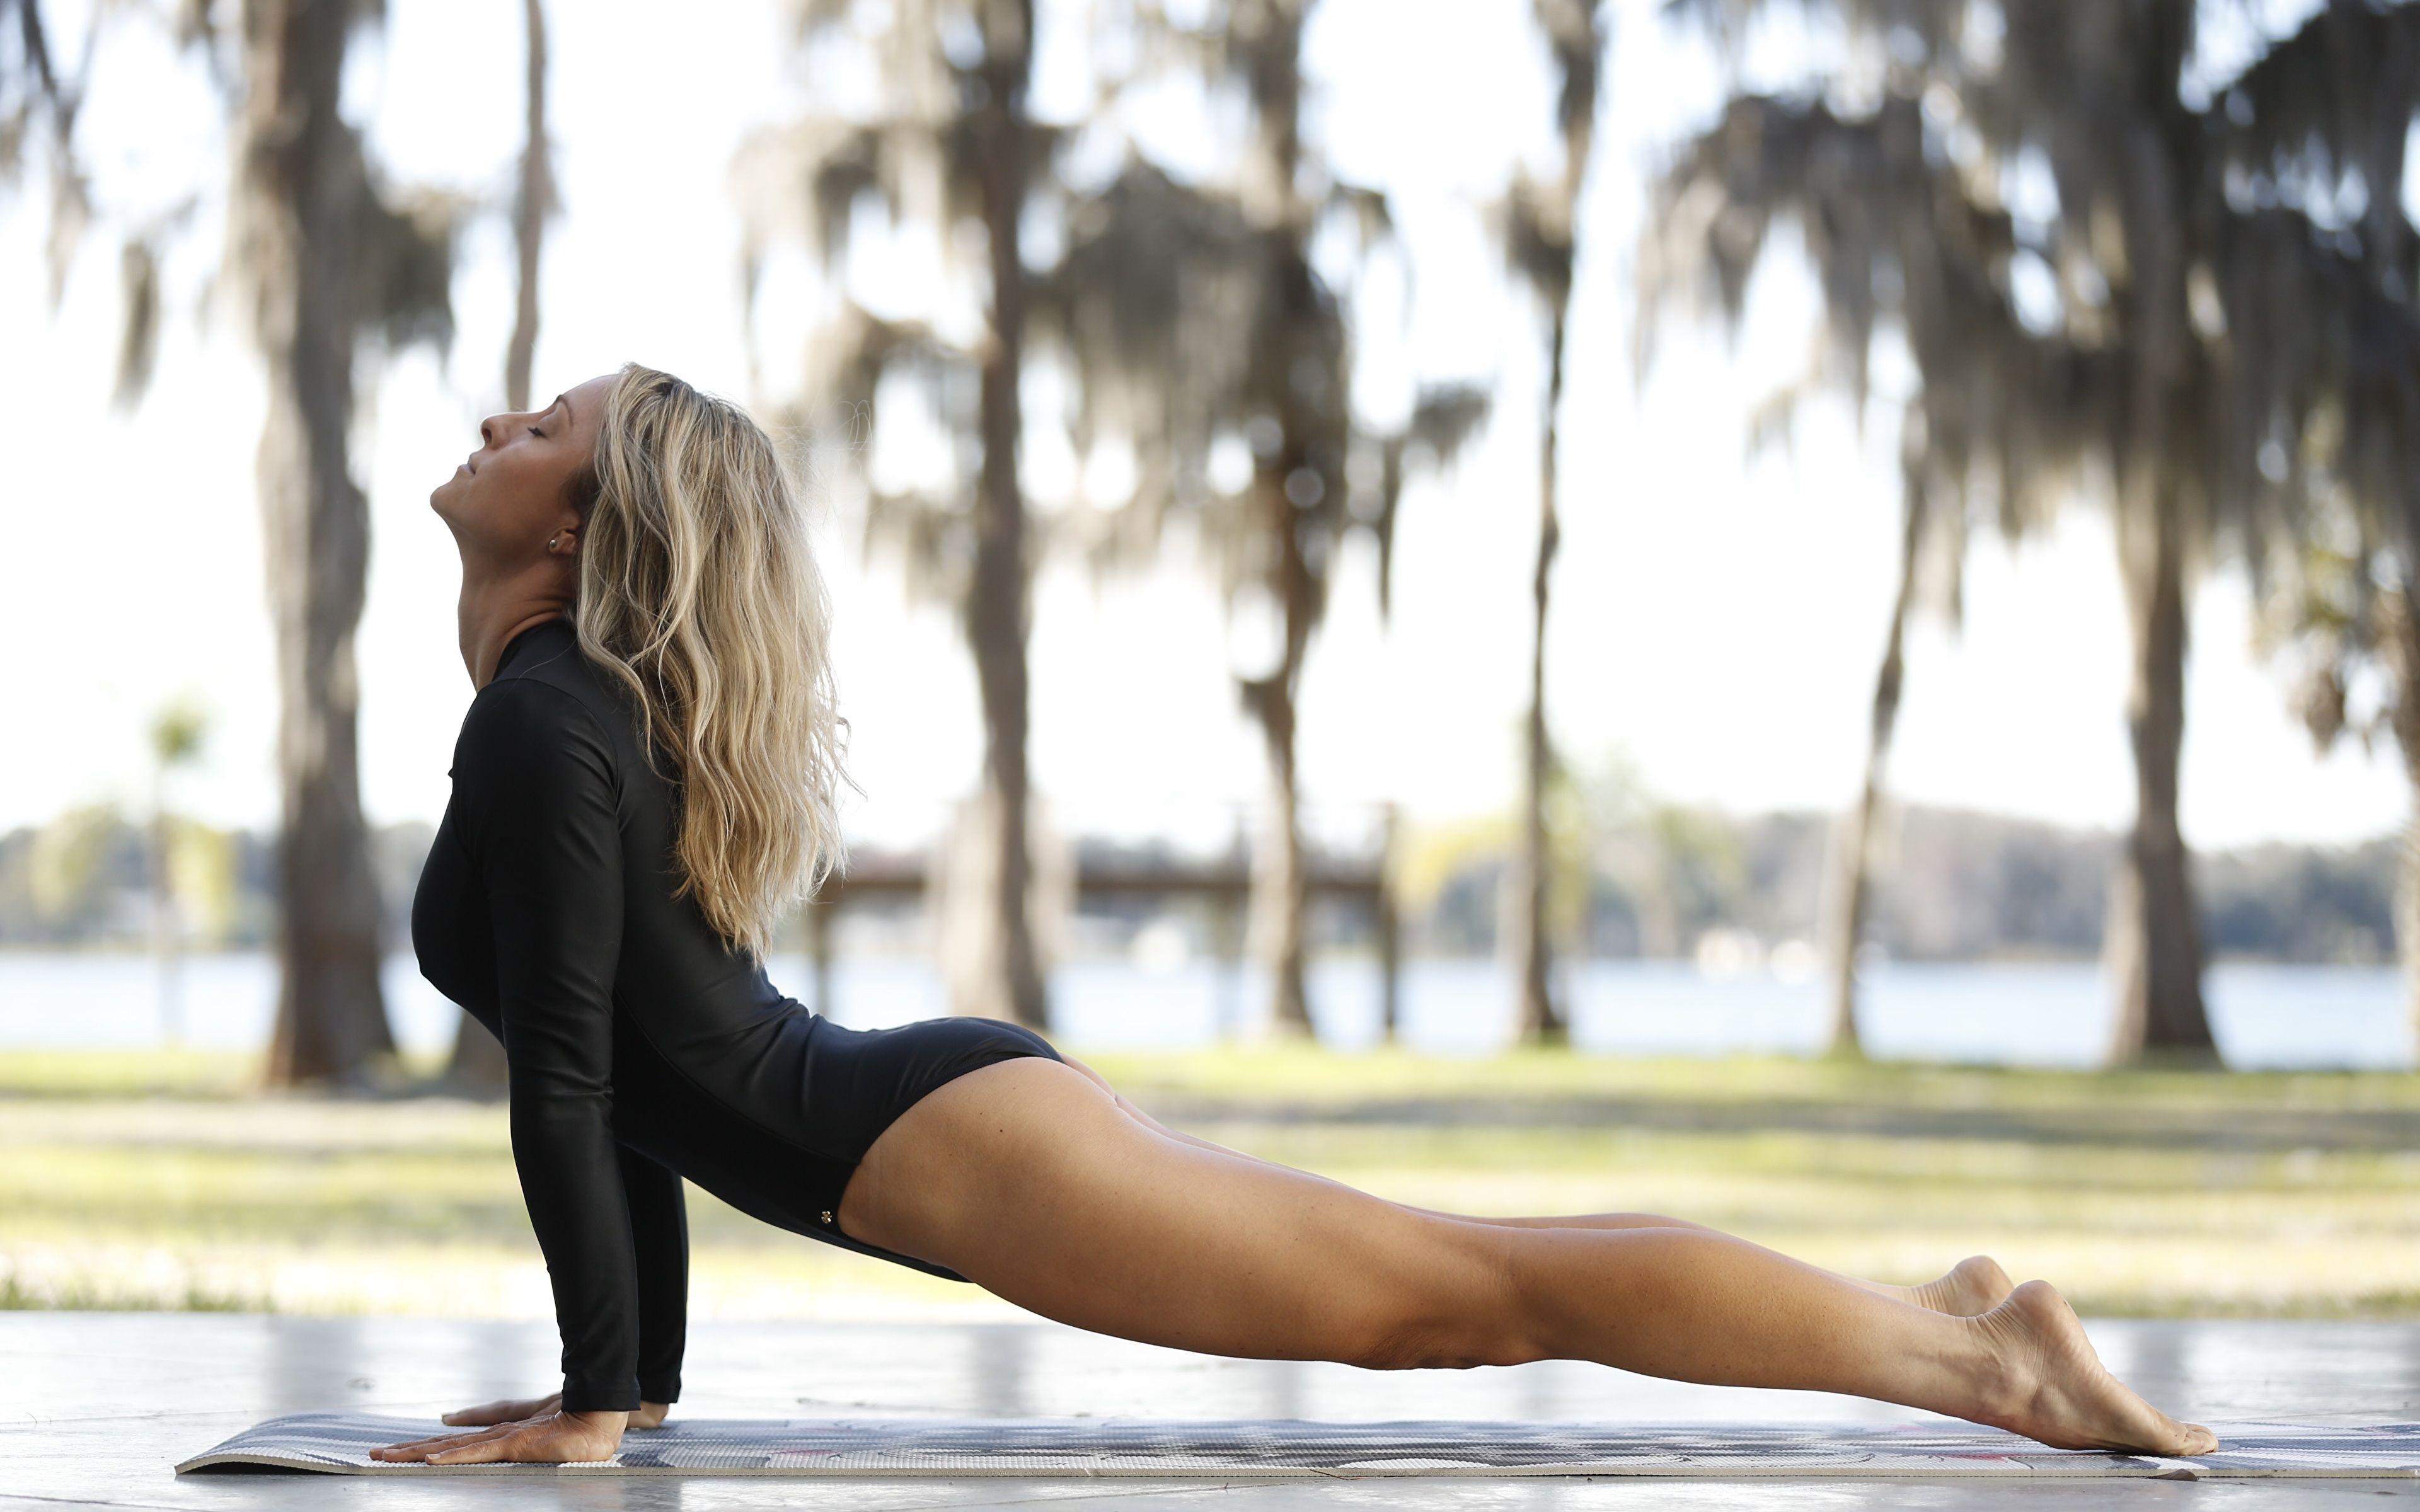 Morning yoga hot girls Yoga Girl Wallpapers Top Free Yoga Girl Backgrounds Wallpaperaccess